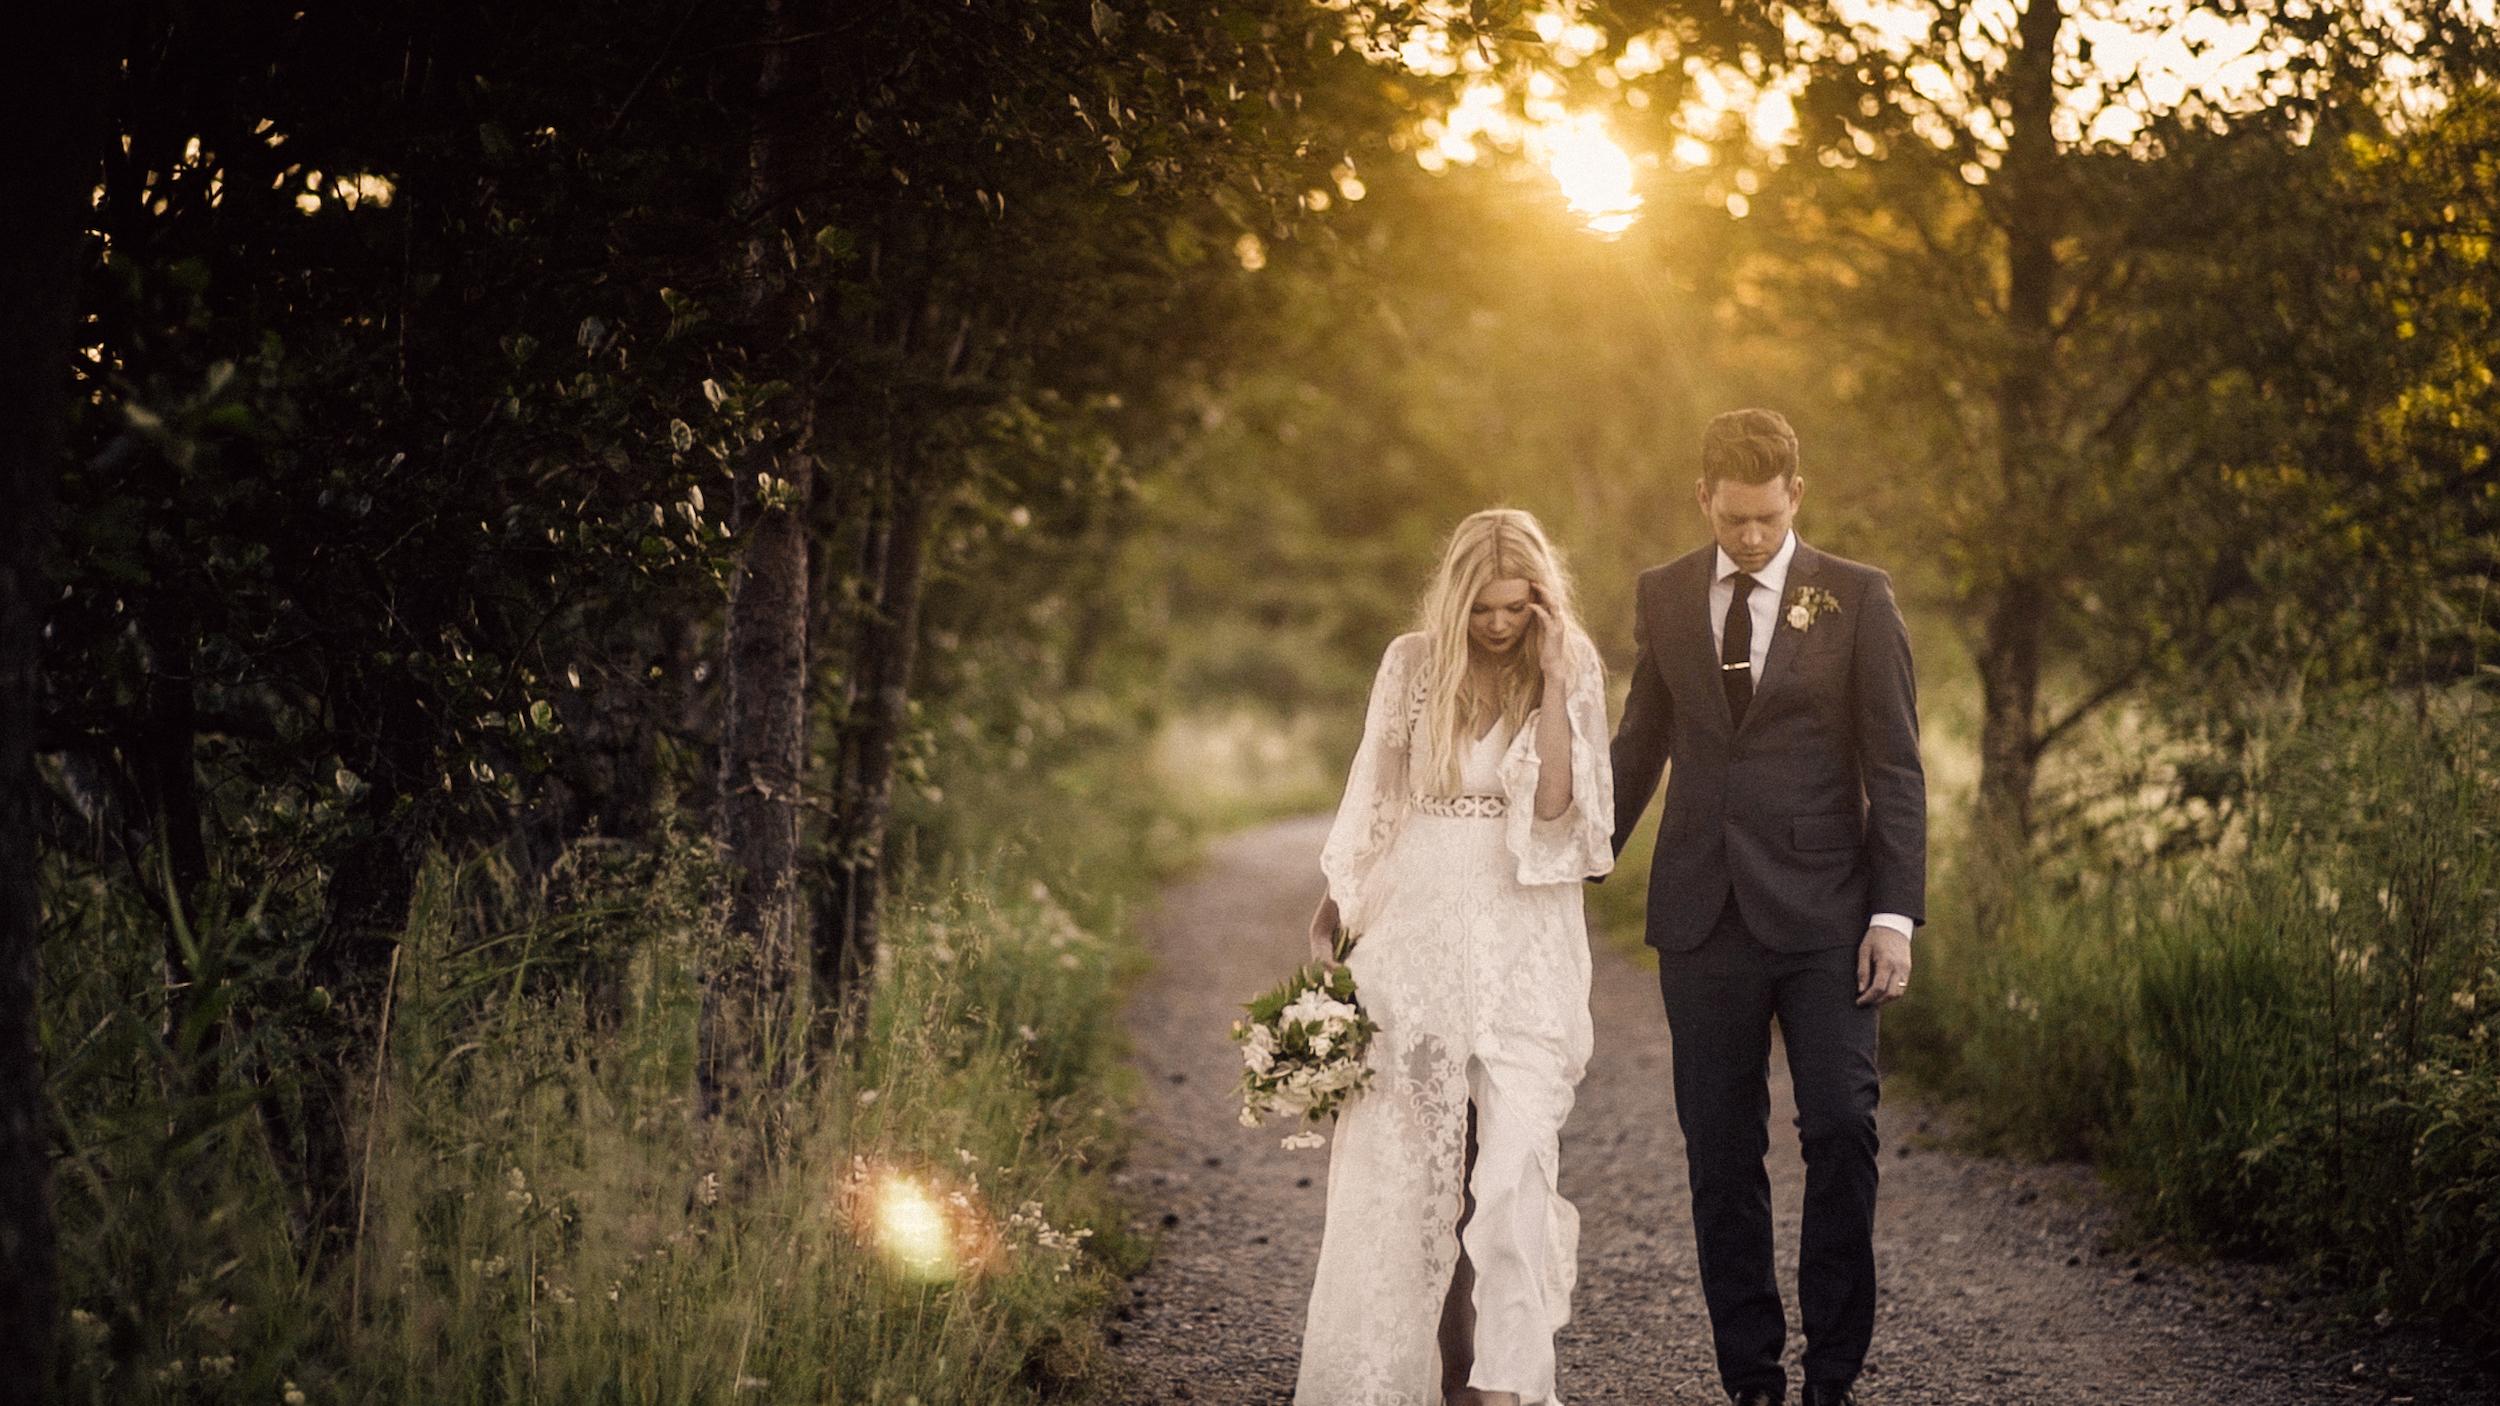 wedding videographer villa andania beach Helsinki